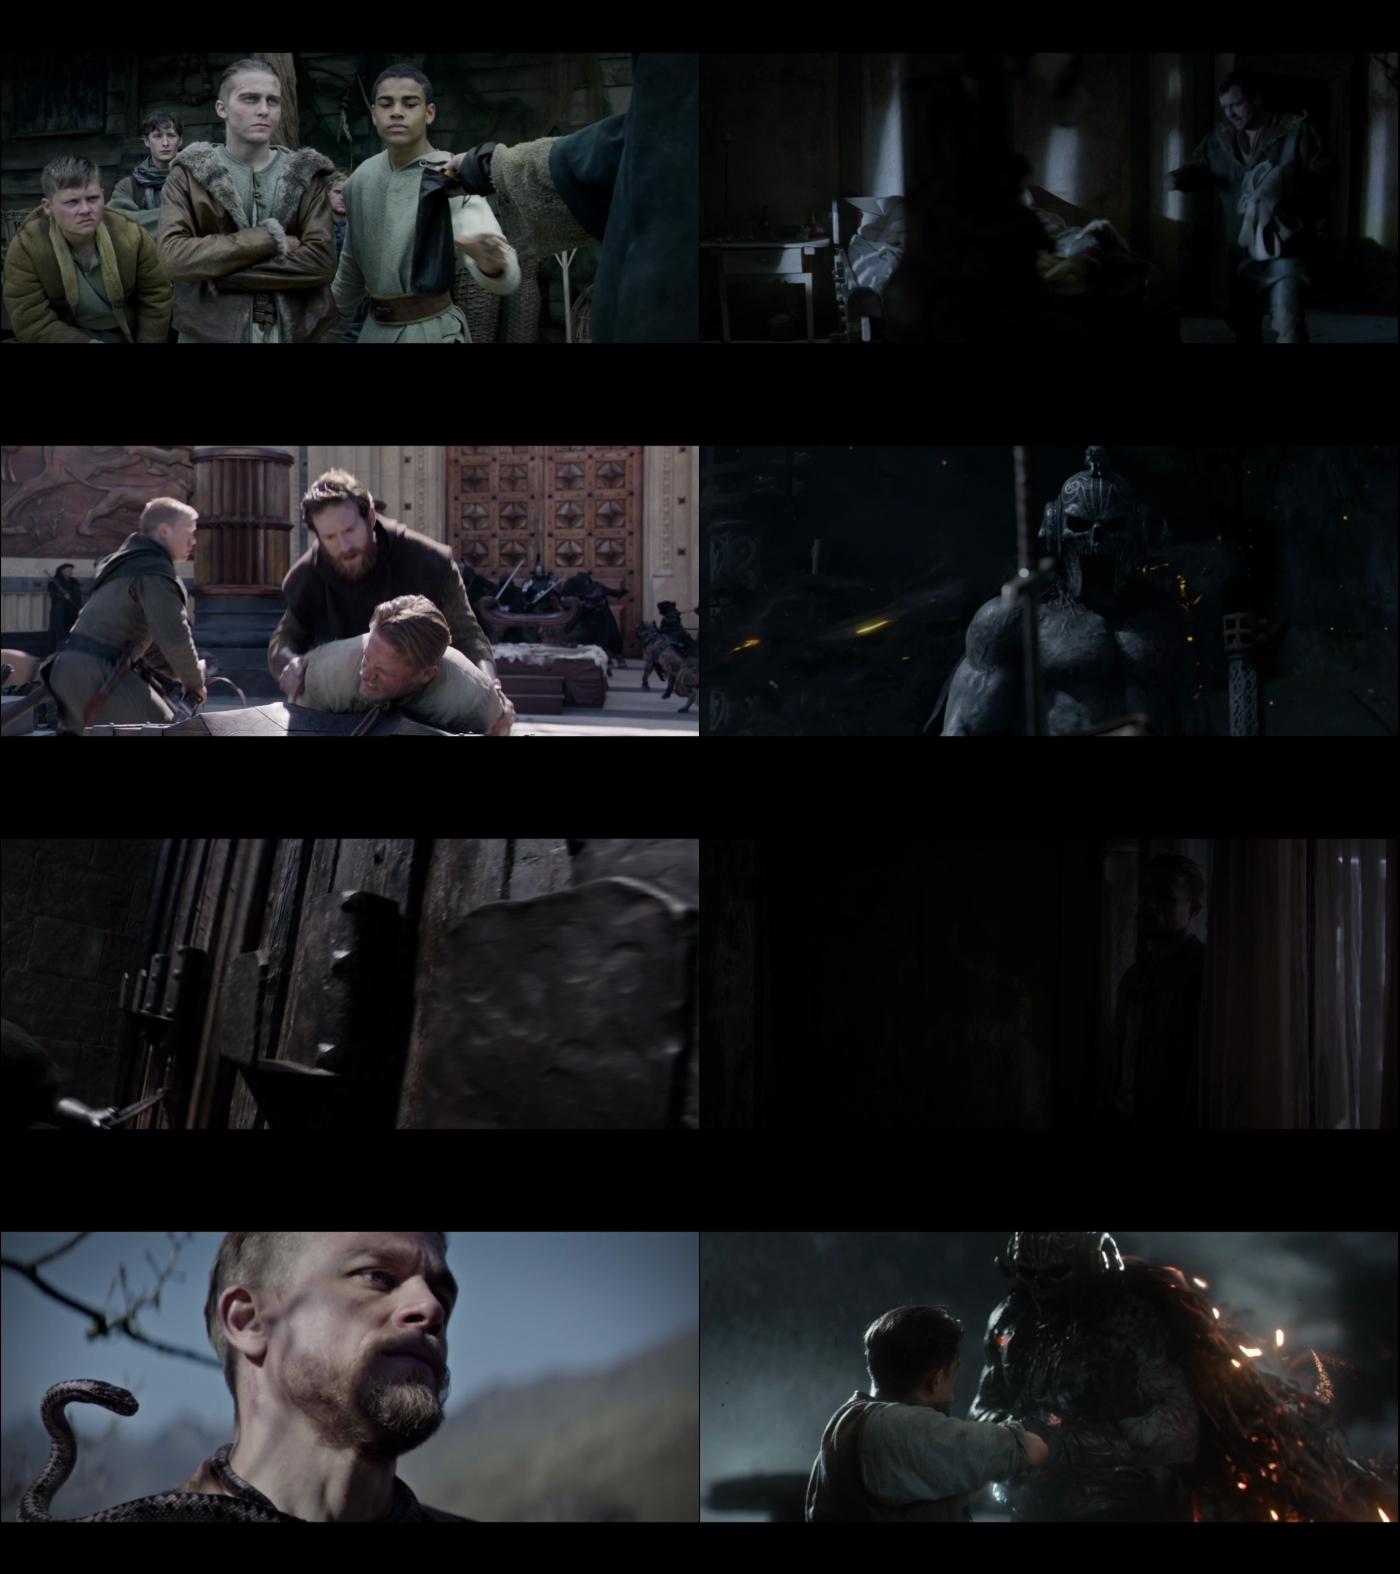 El Rey Arturo La Leyenda de la Espada 1080p Latino